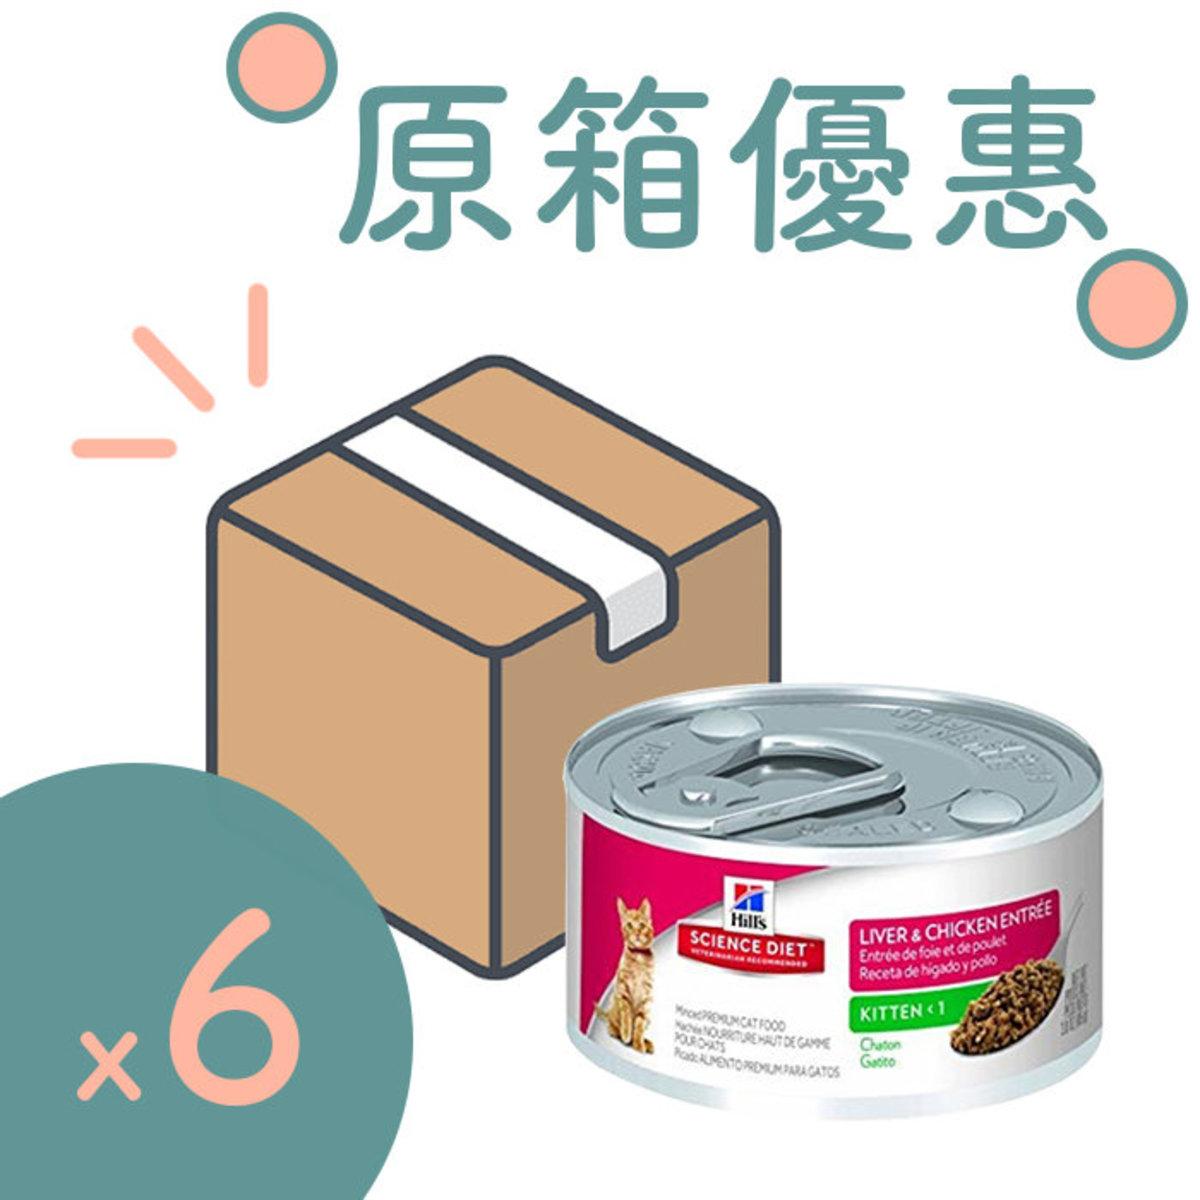 [6PCS SET] Kitten Feline Chicken & Liver Entree Cat Canned 5.5oz